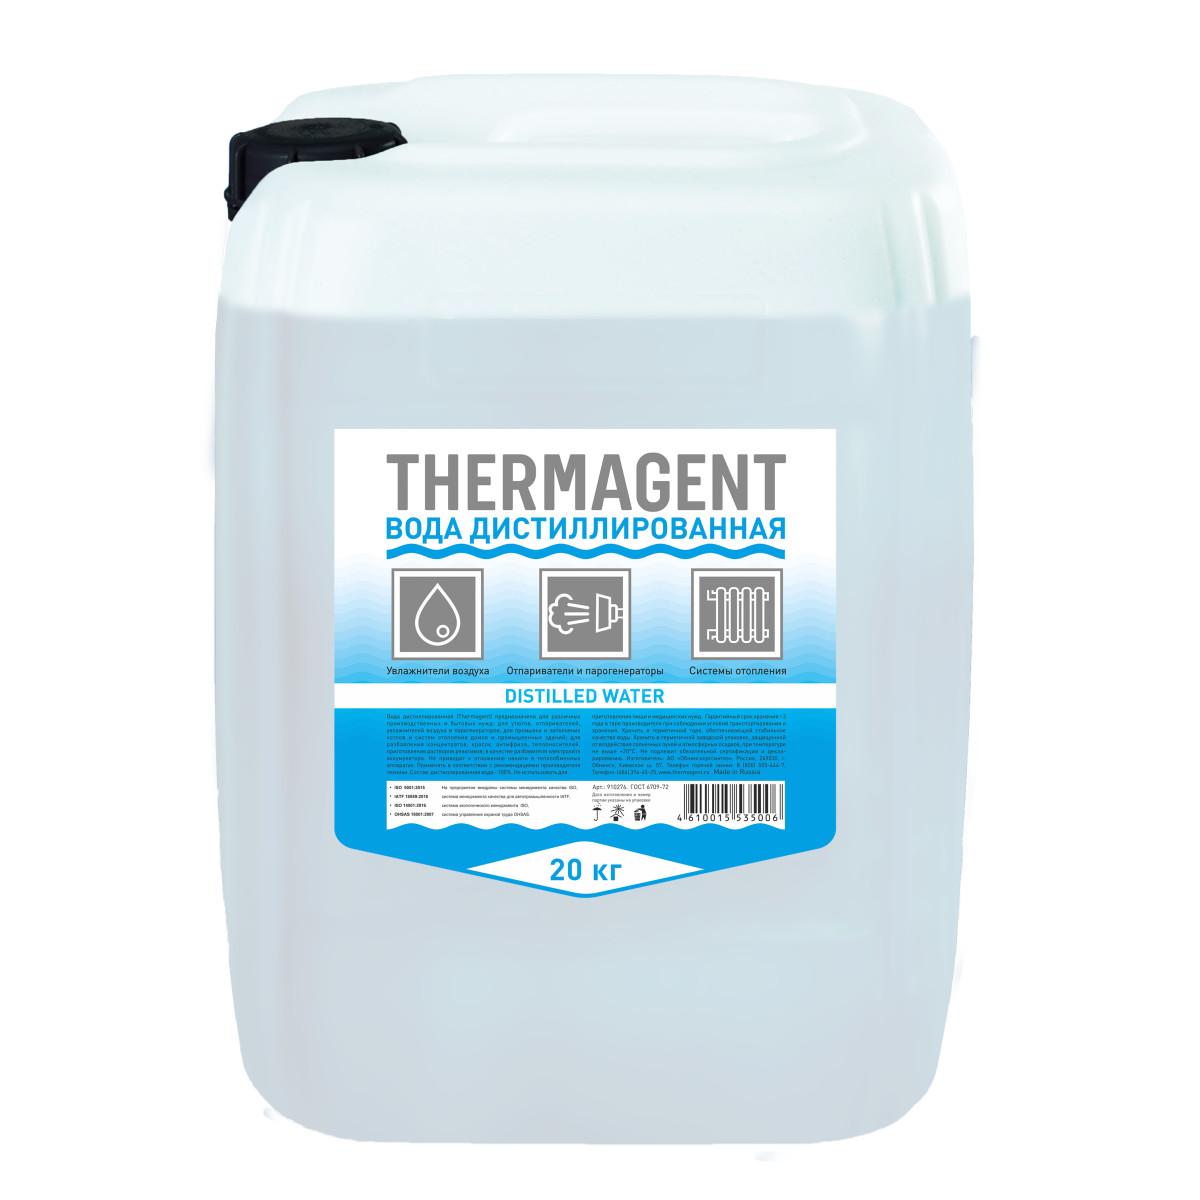 Вода дистиллированная Thermagent 20 л